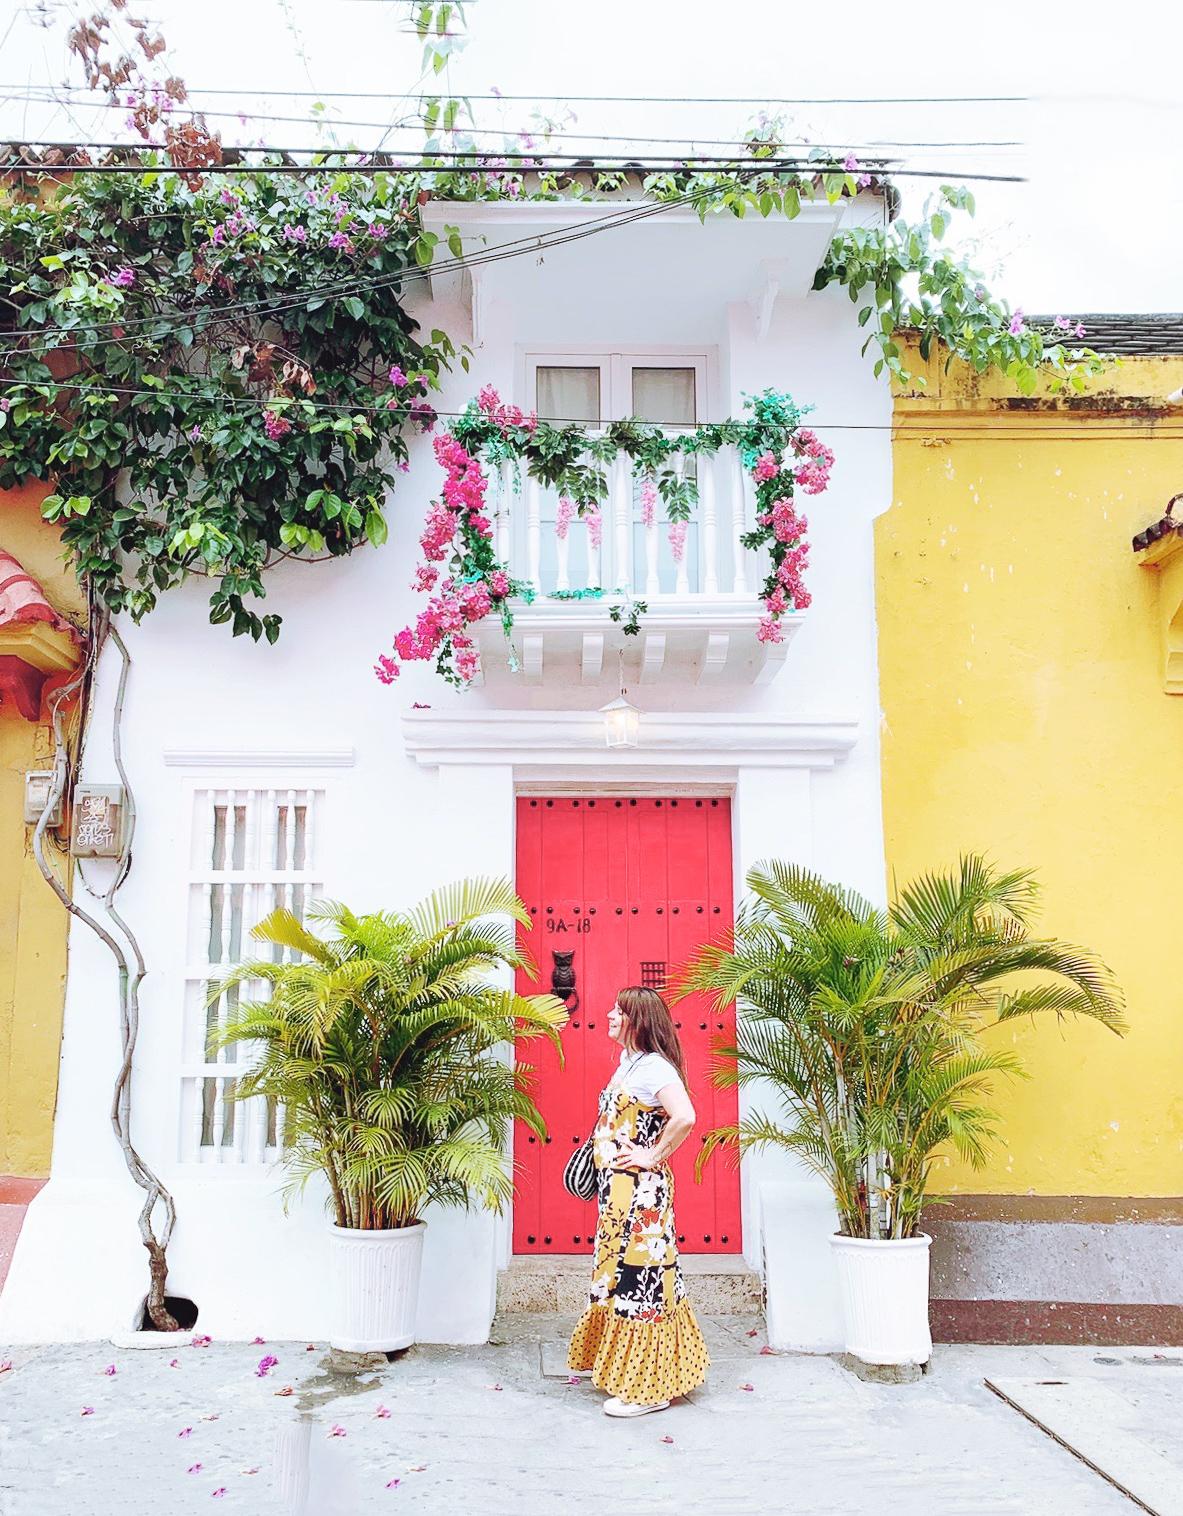 Cartagena and its doors